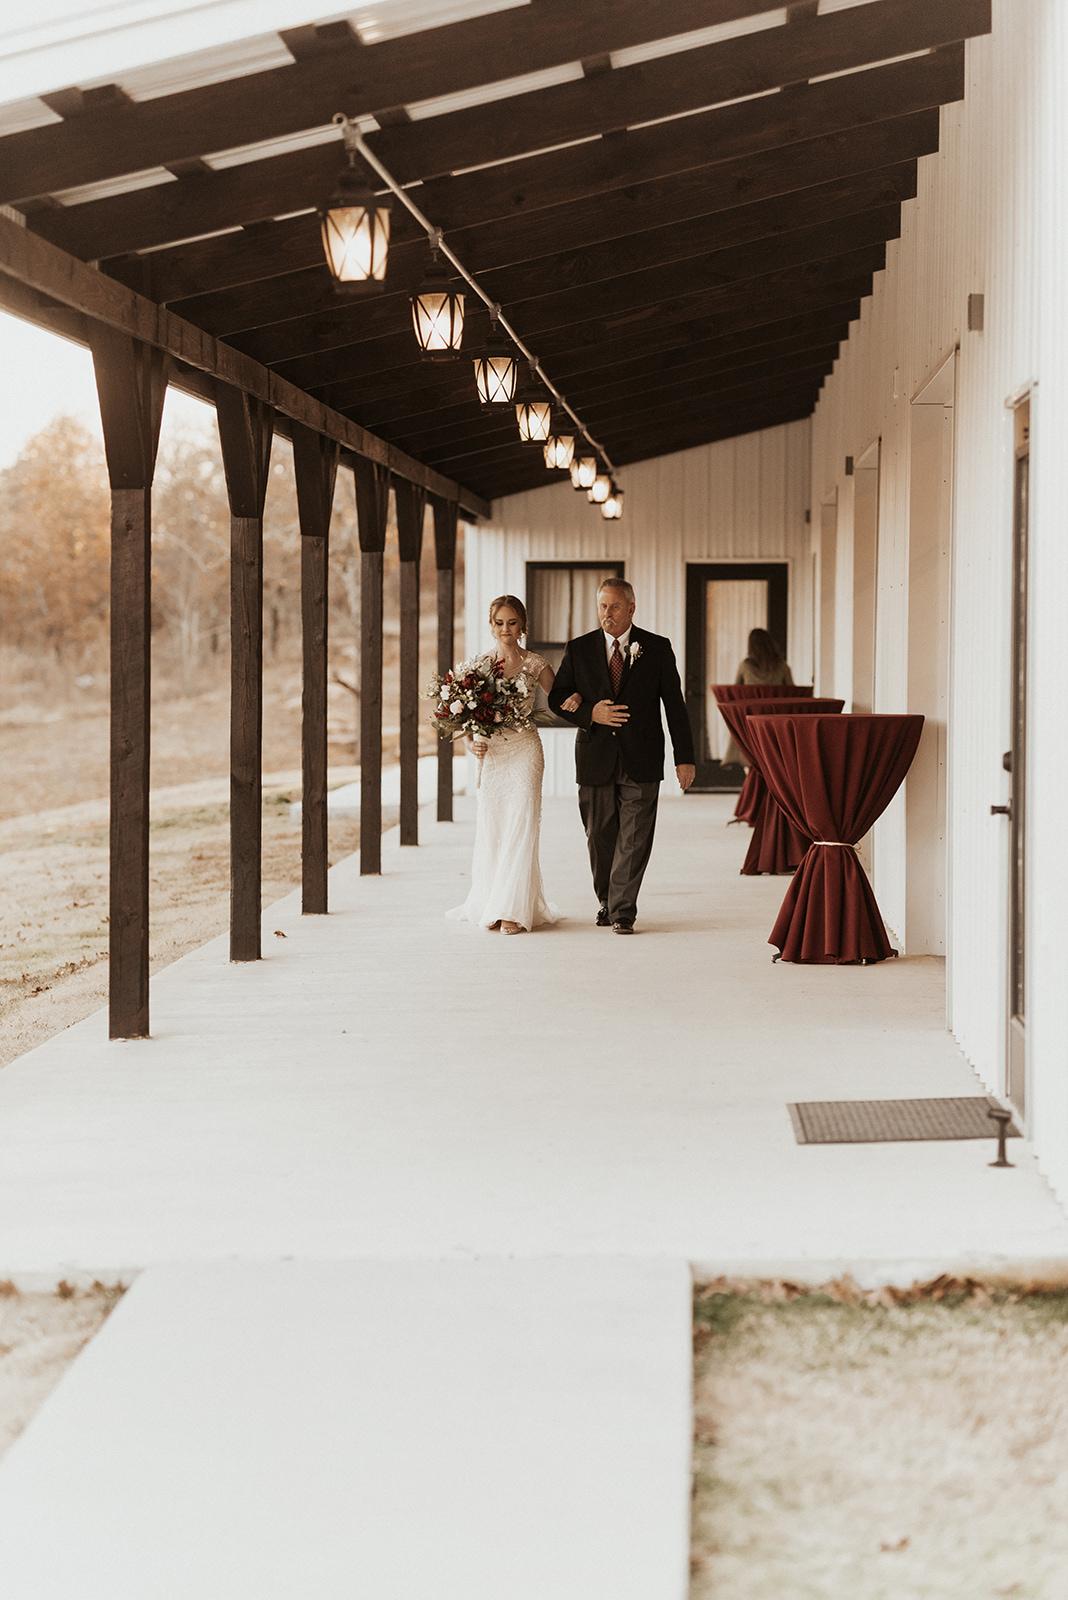 Best Wedding Venue in Tulsa Bixby Dream Point Ranch 44.jpg